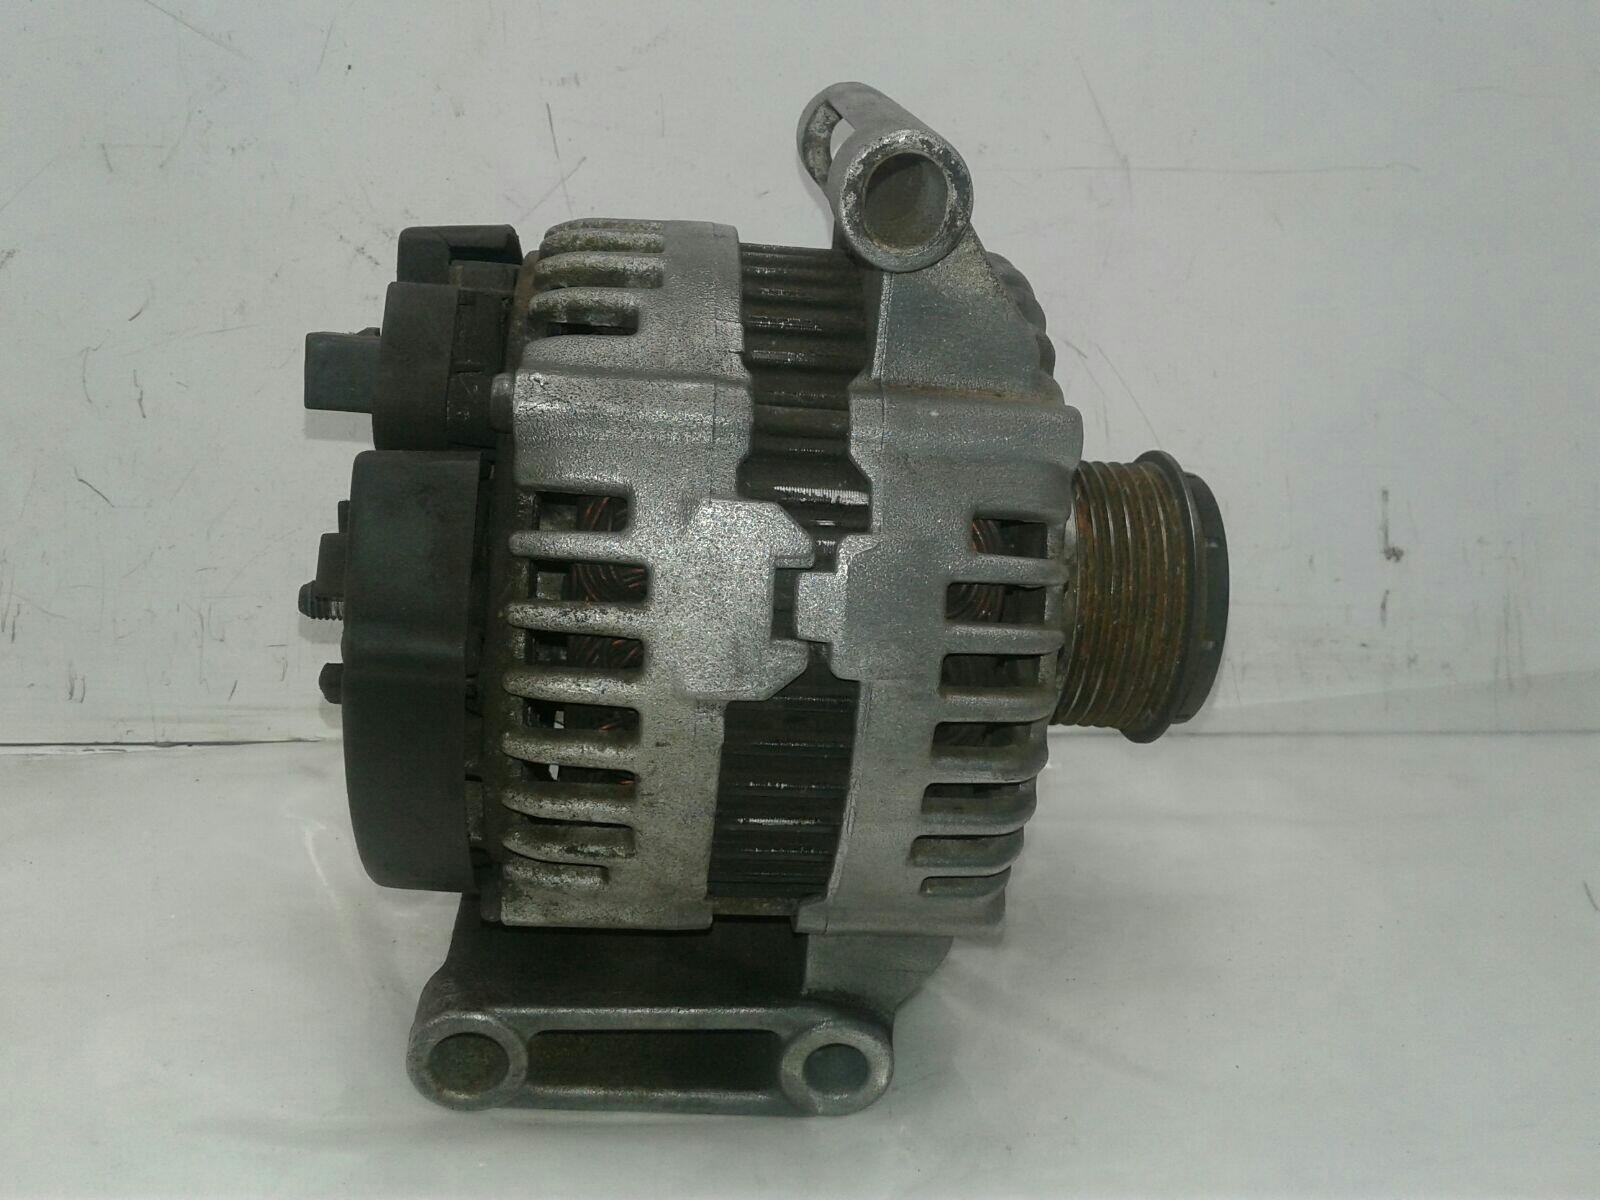 Fiat Ducato 2006 To 2011 Alternator Diesel Manual For Sale From Wiring Diagram 06 11 22 4hv Warranty 7379840